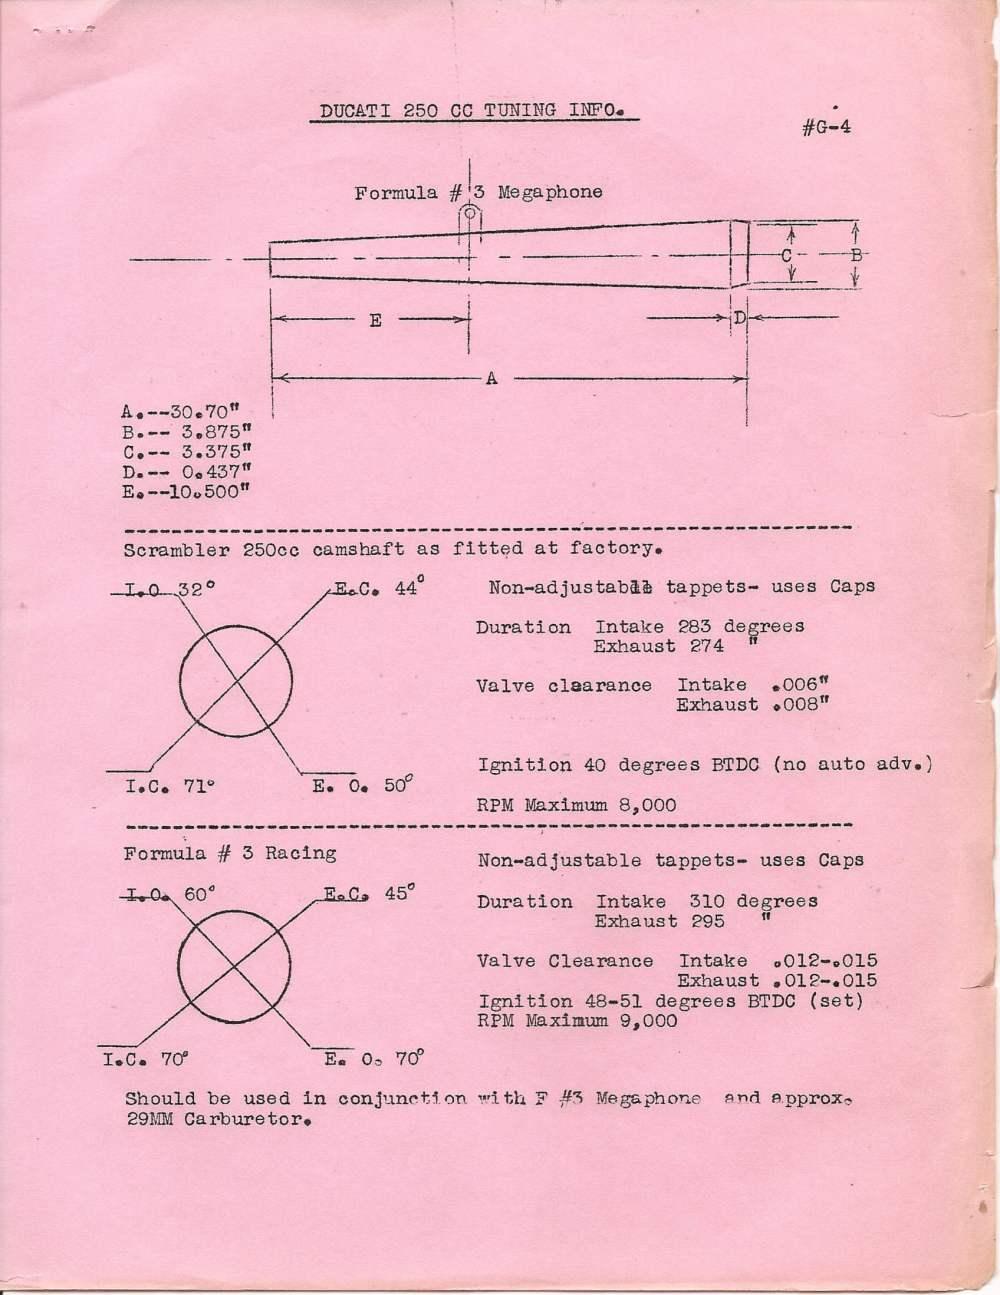 medium resolution of  electrical equipment bulletin g 4 ducati 250cc tuning info